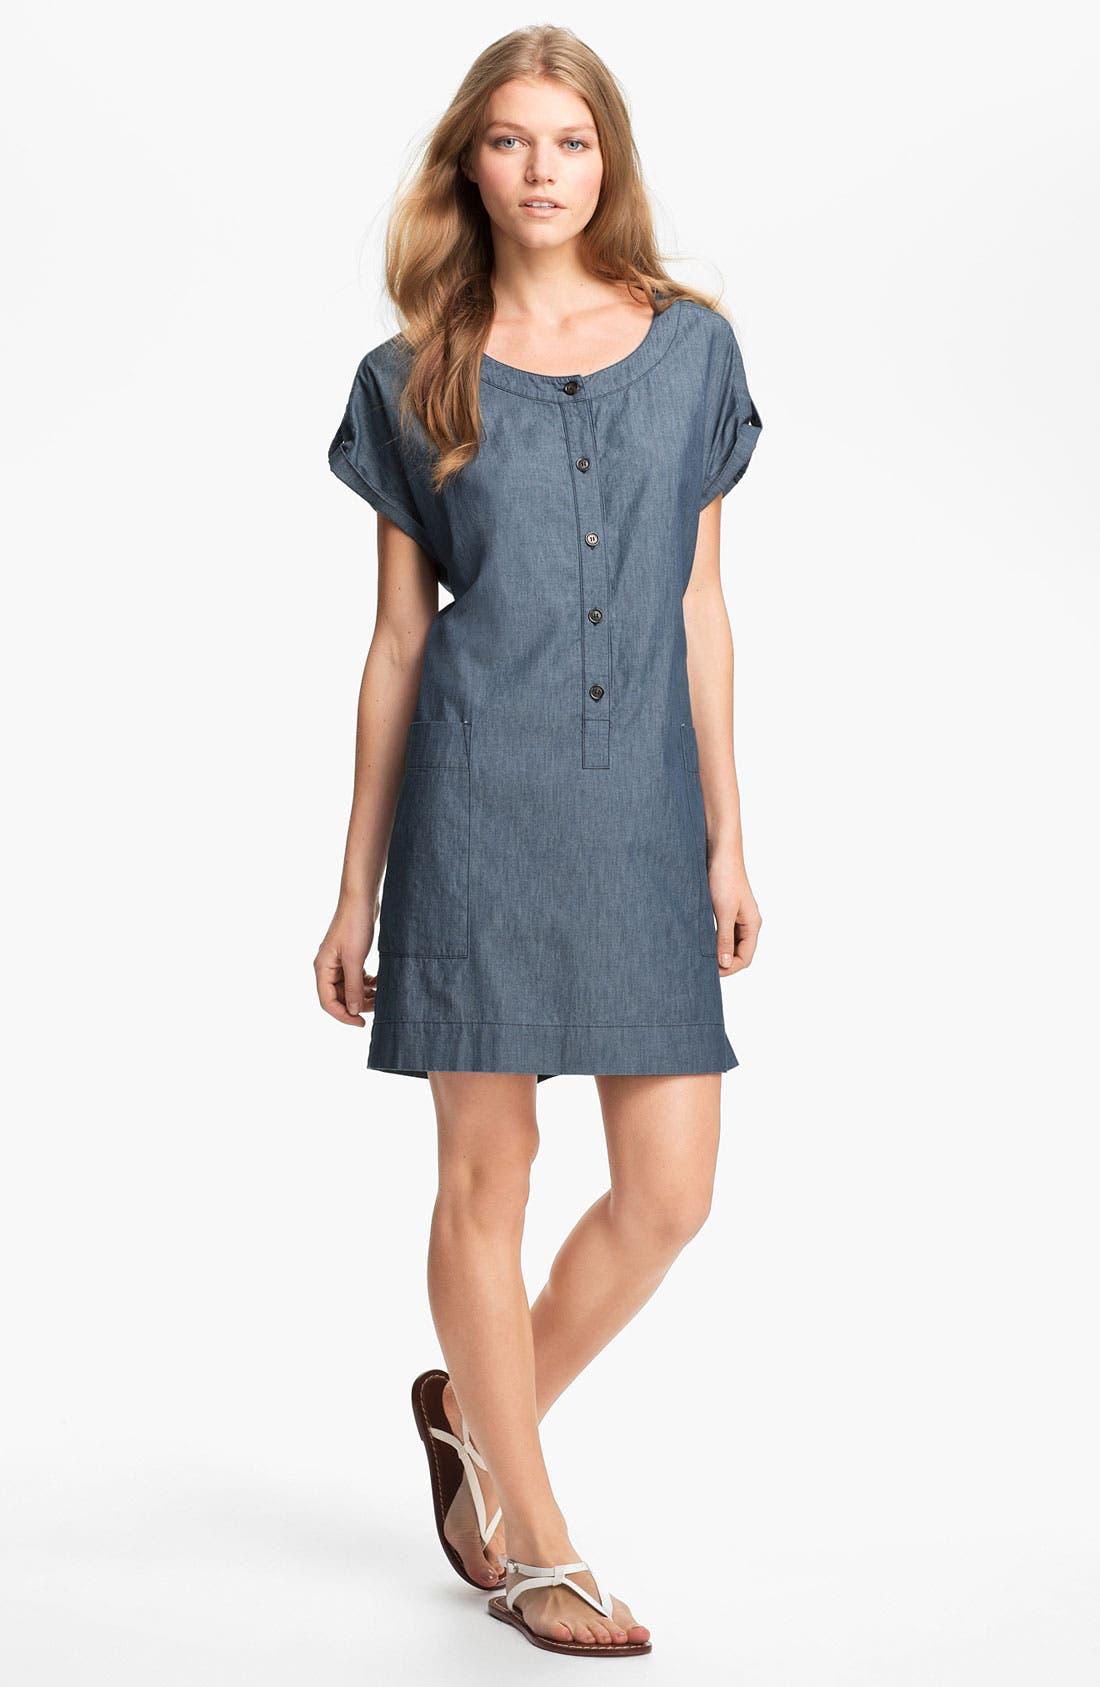 Main Image - Weekend Max Mara 'Kelly' Dress